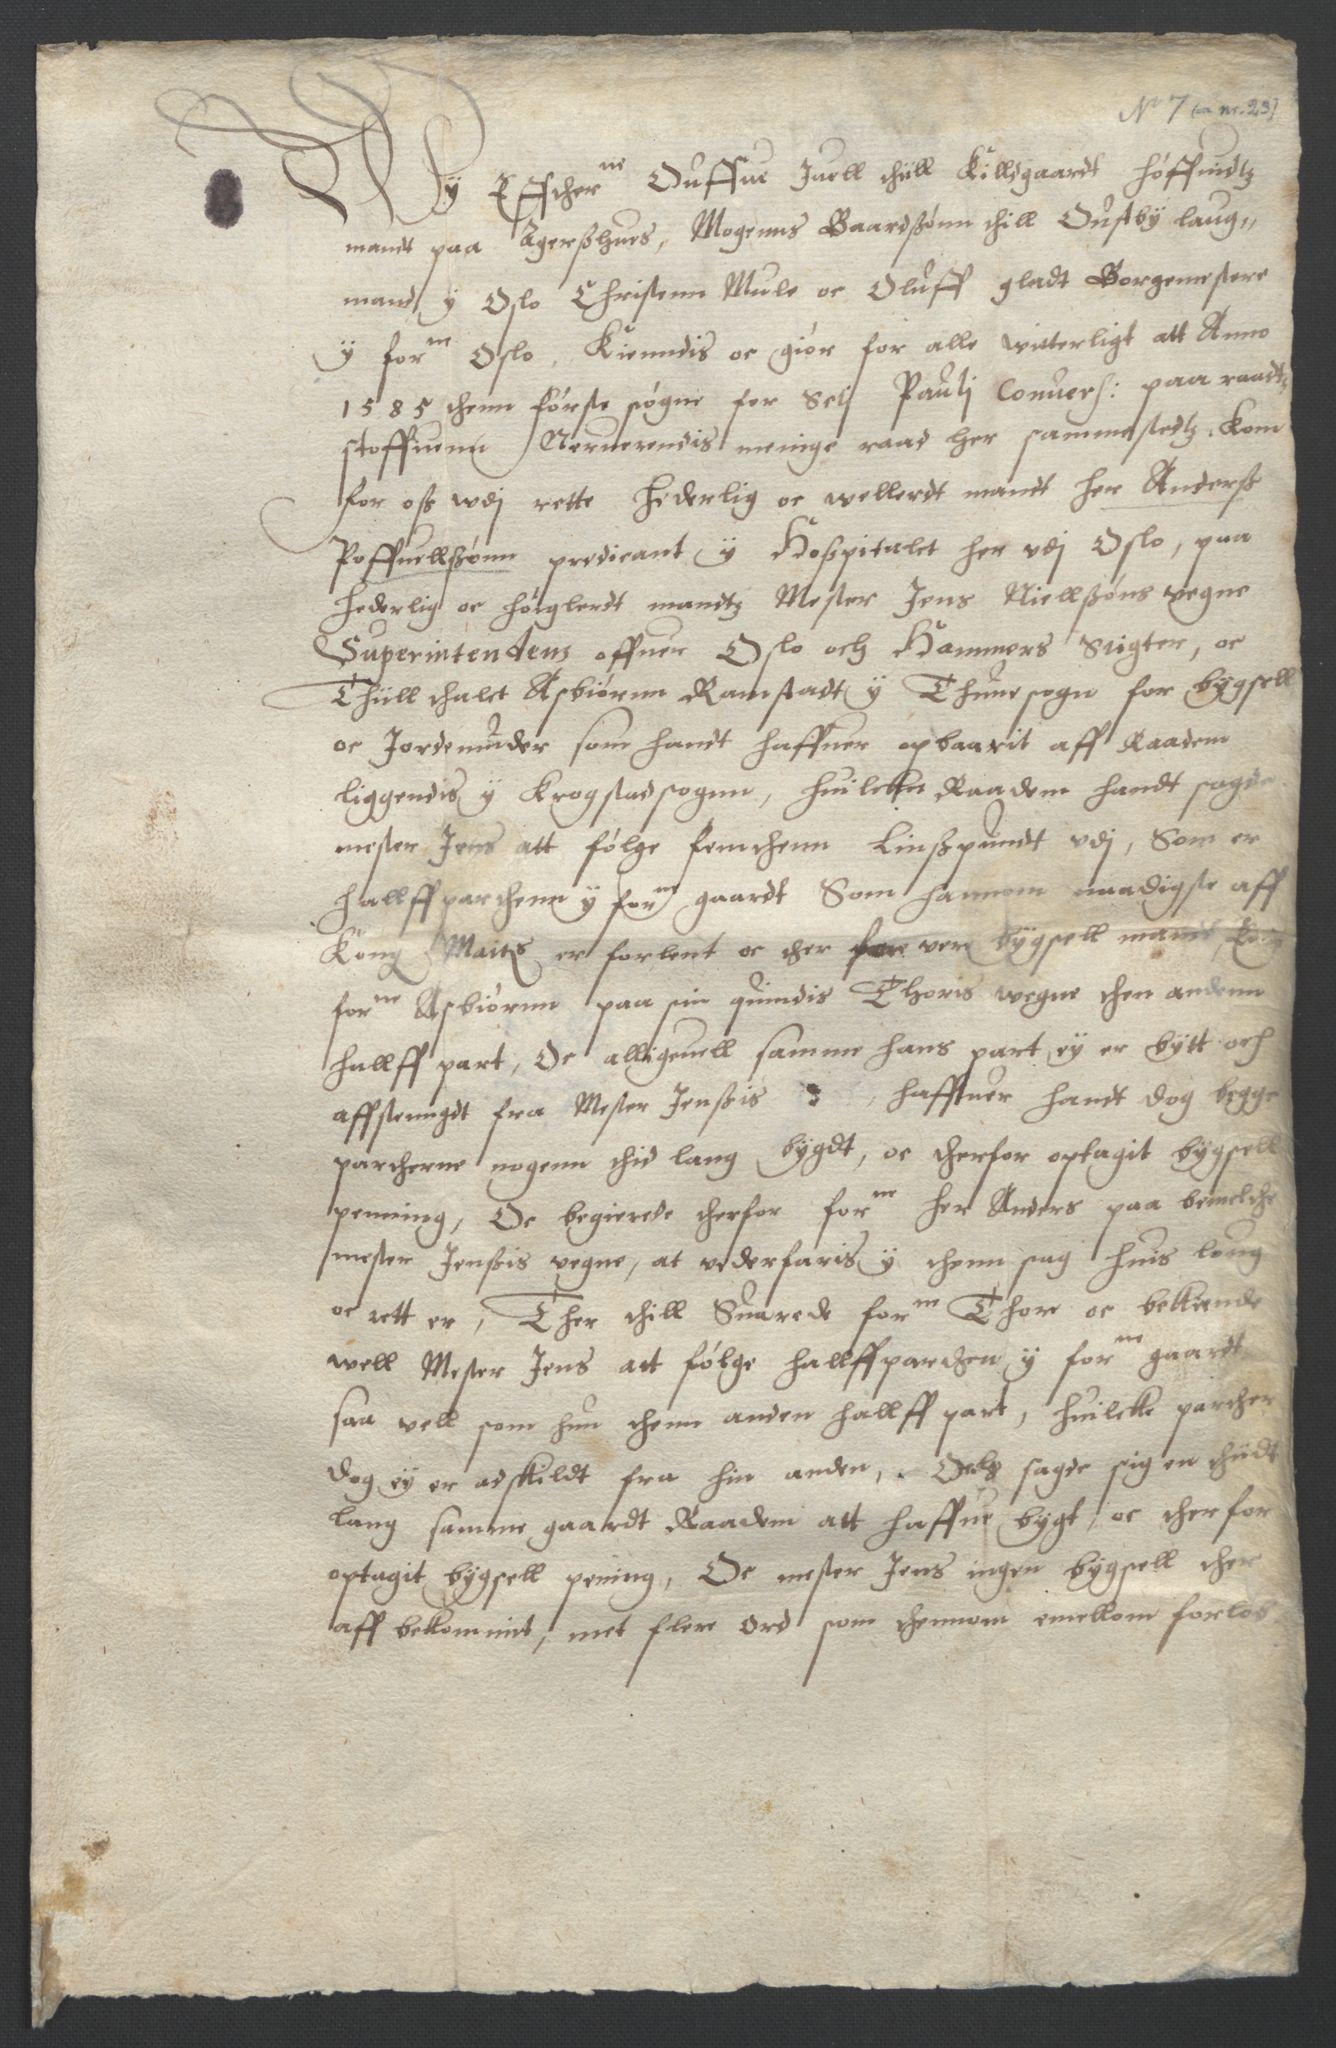 SAO, Oslo stiftsdireksjon, G/Gb/L0001: Bispestolens dokumenter, 1584-1612, s. 7